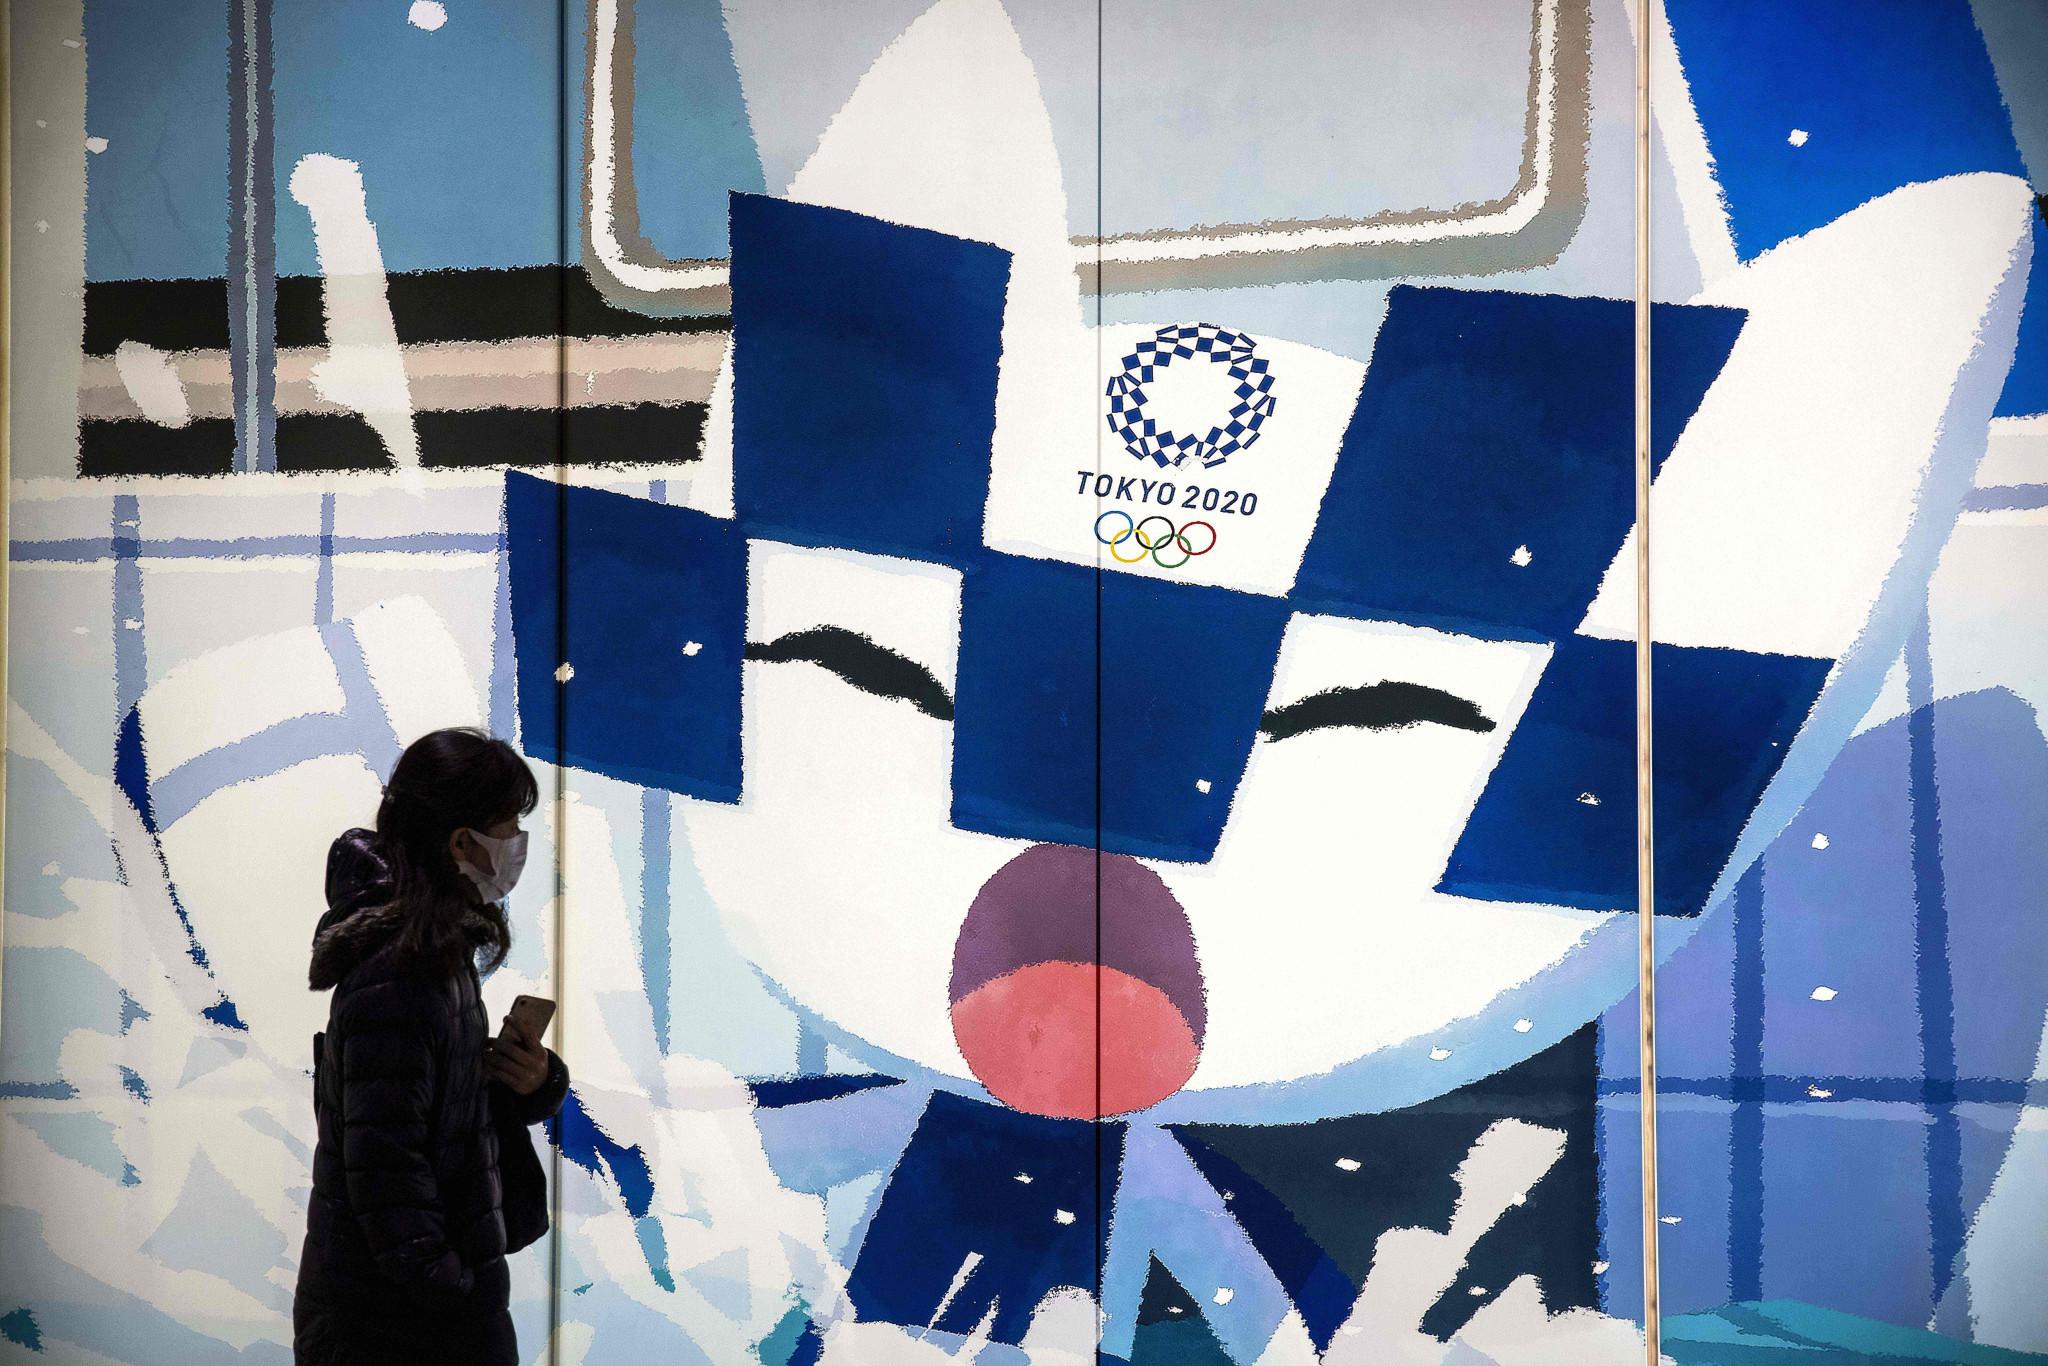 Tokyo 2020 preparations to headline IOC Executive Board meeting